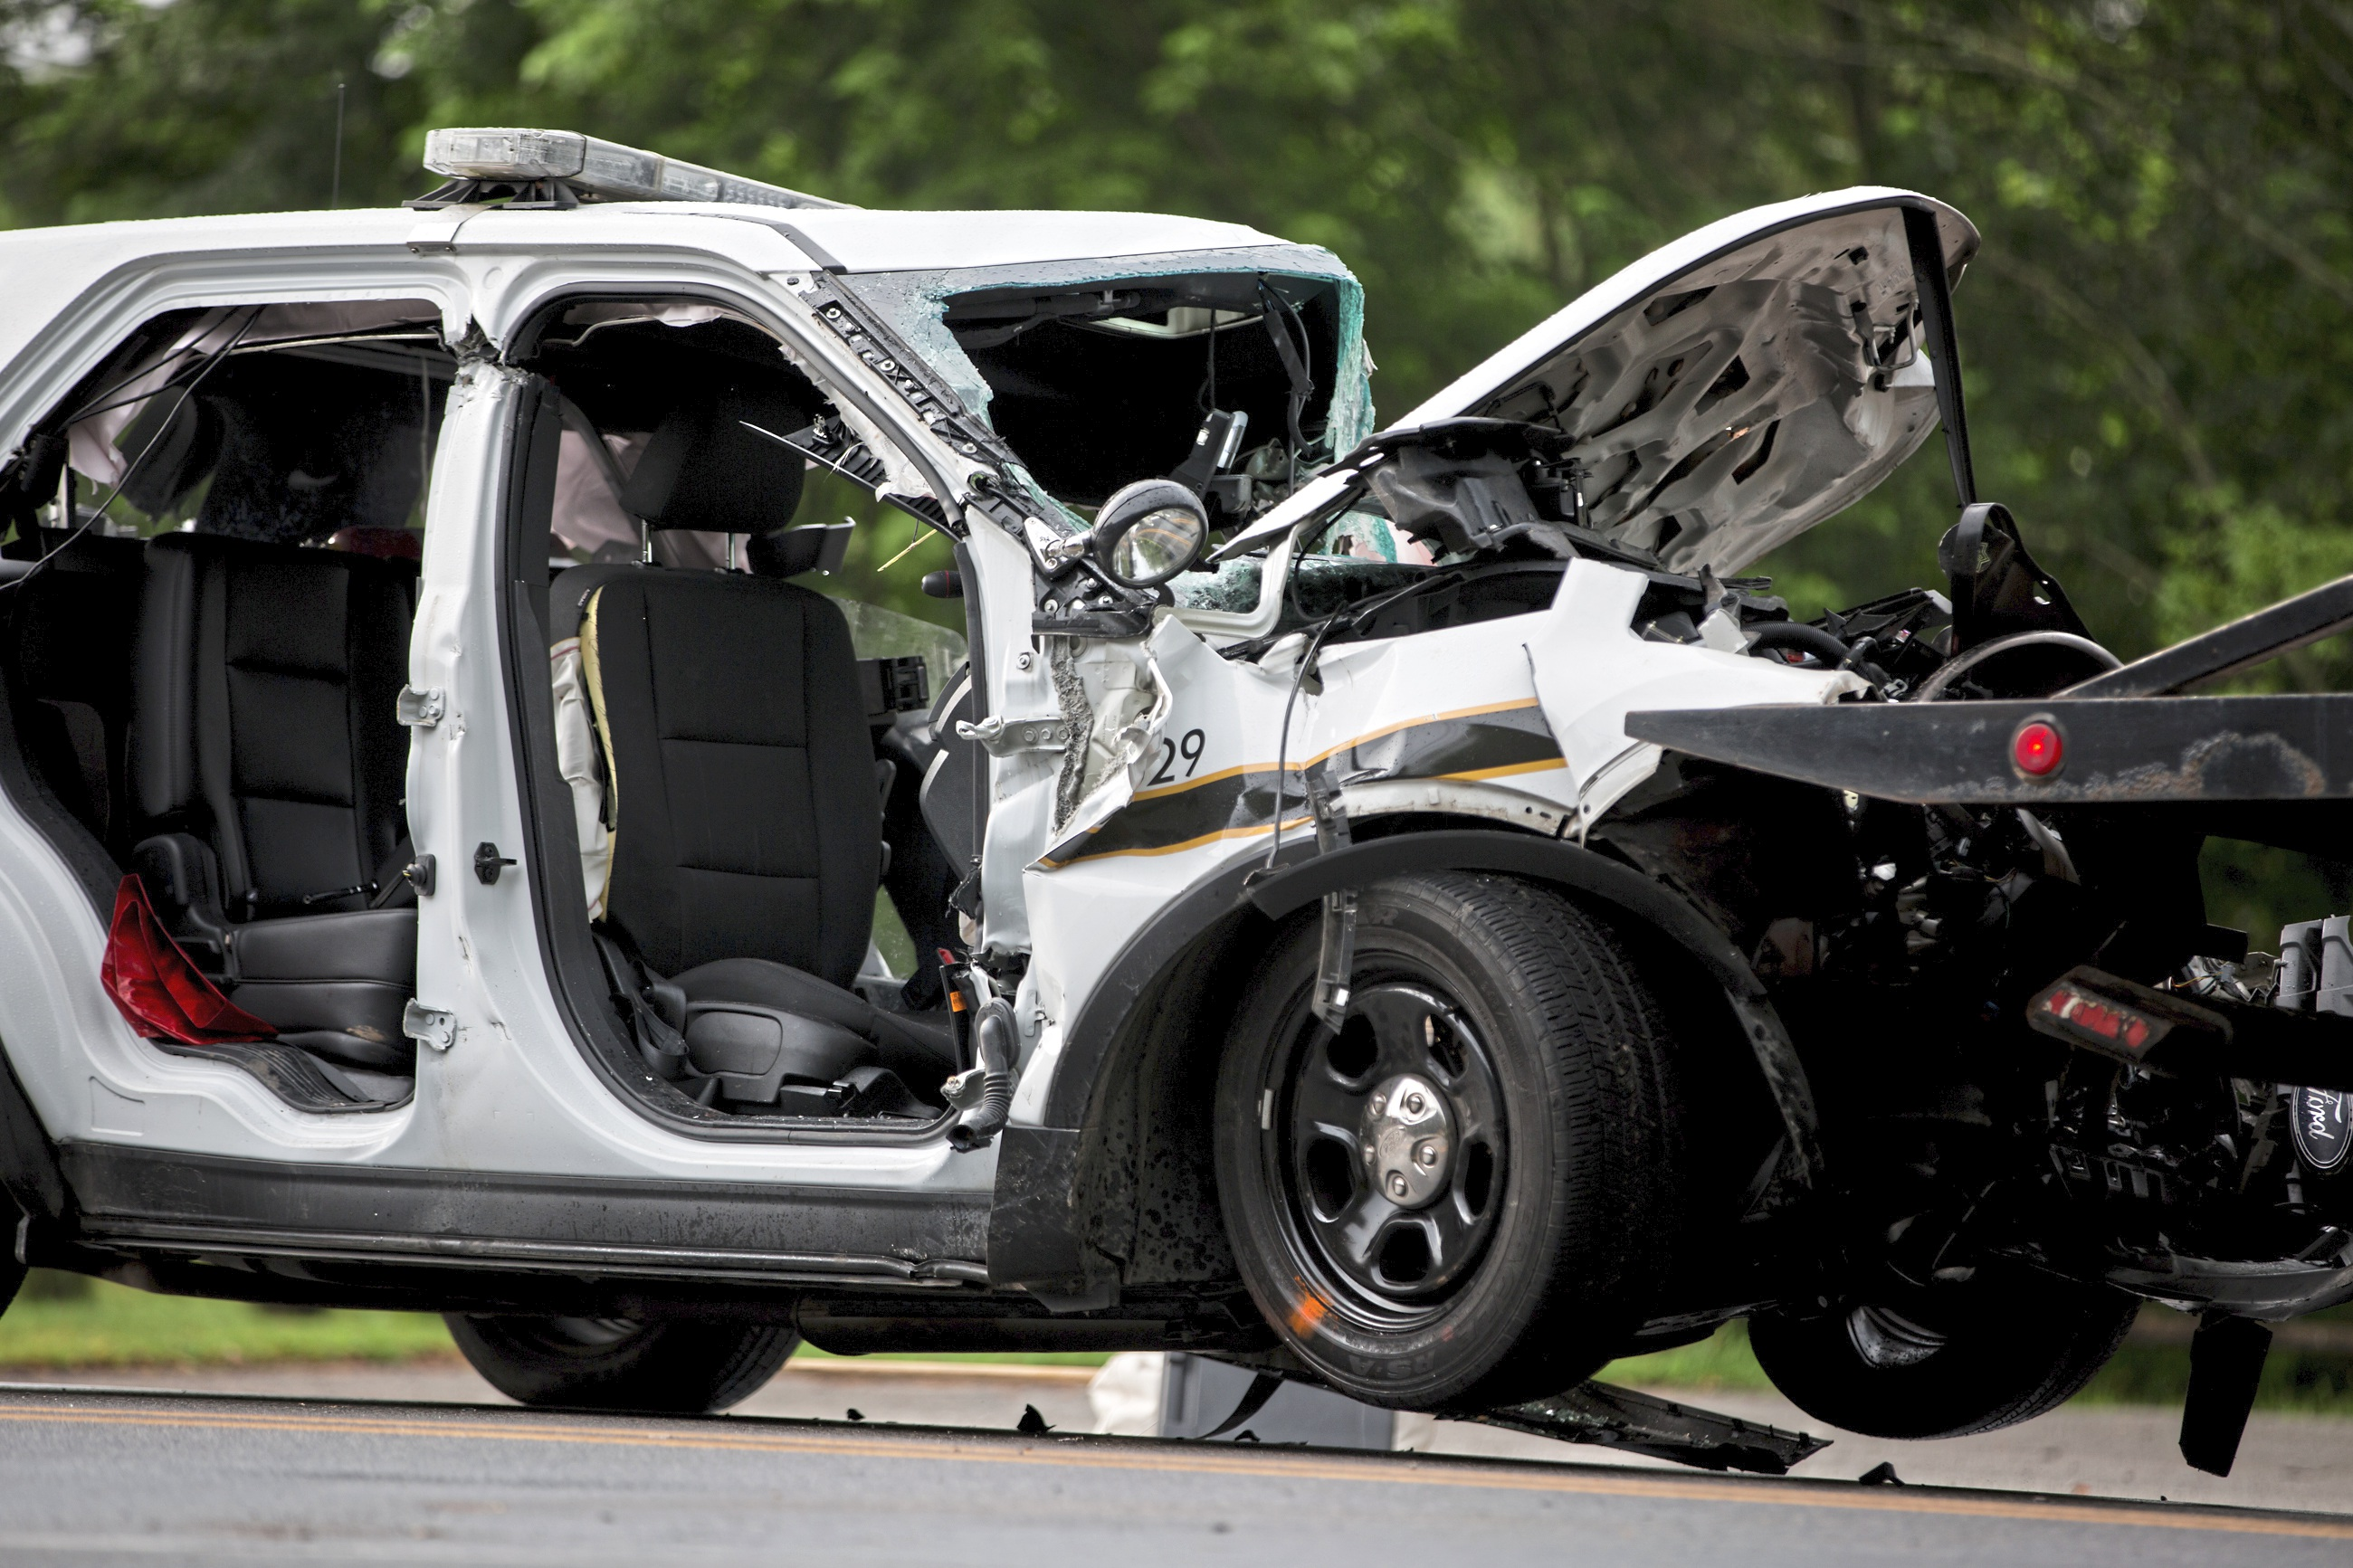 Coroner rules death of state trooper in Ligonier crash as